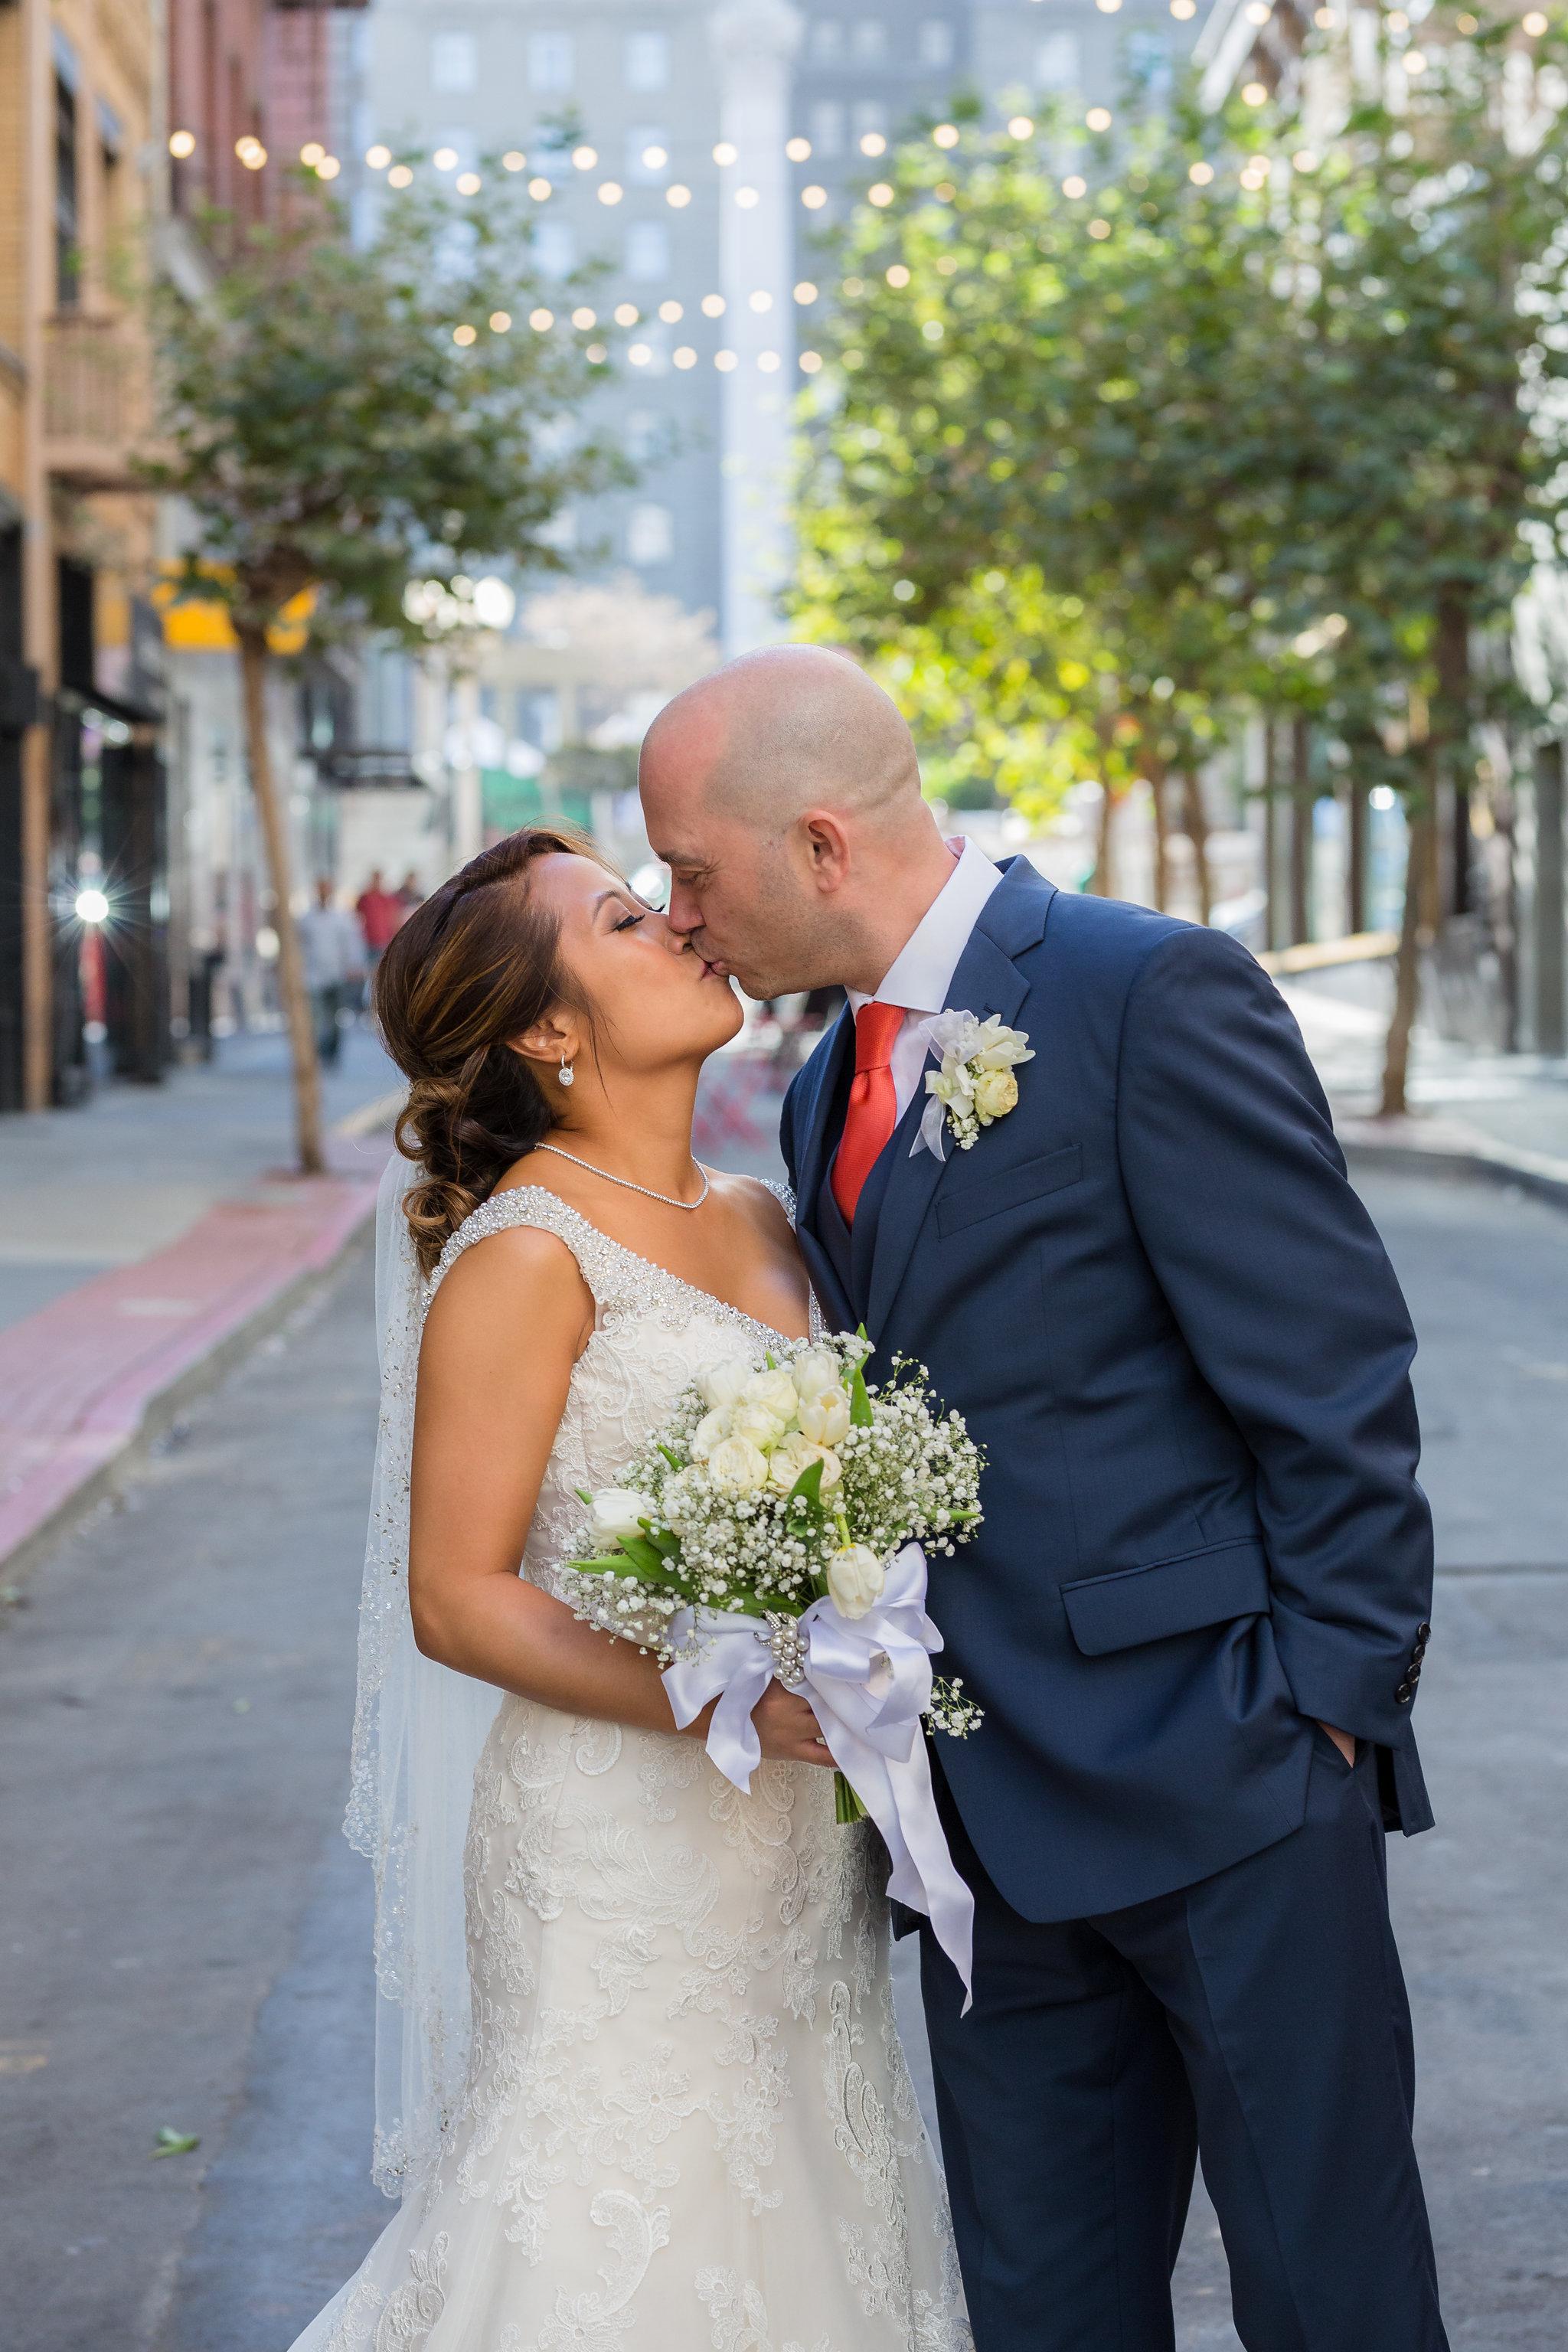 union square wedding photography-8.jpg